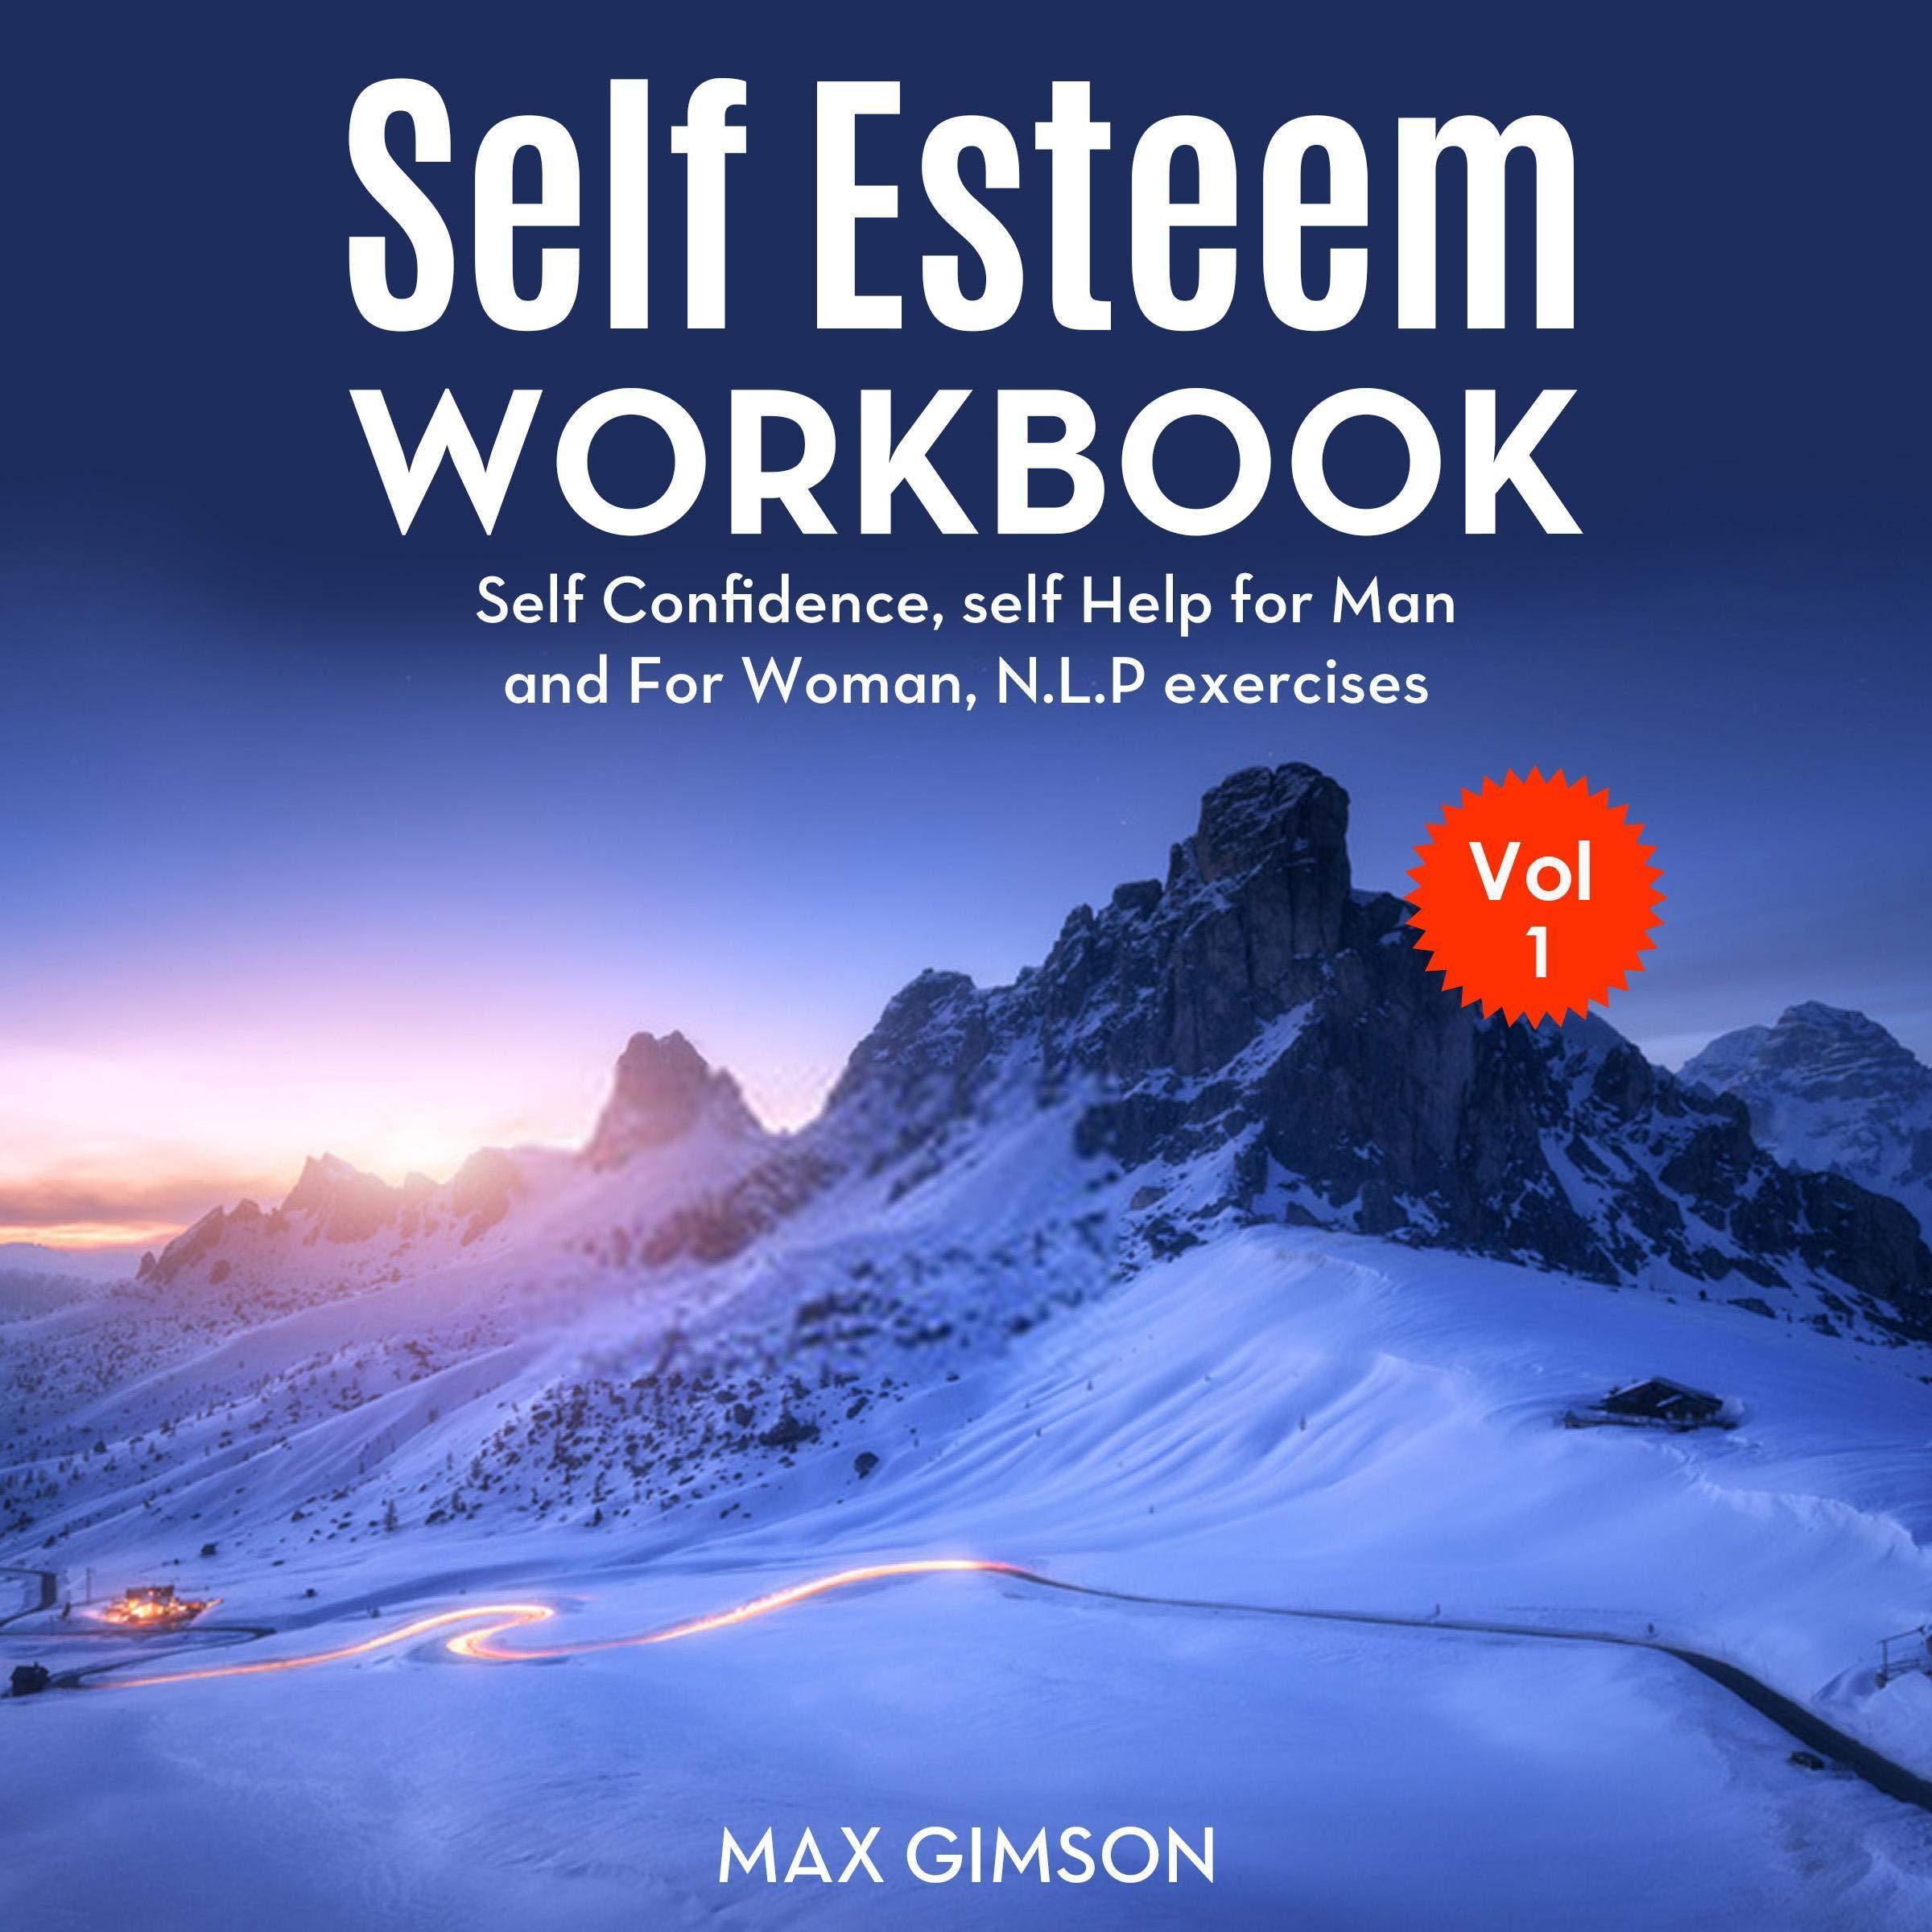 The Self Esteem Workbook Pdf